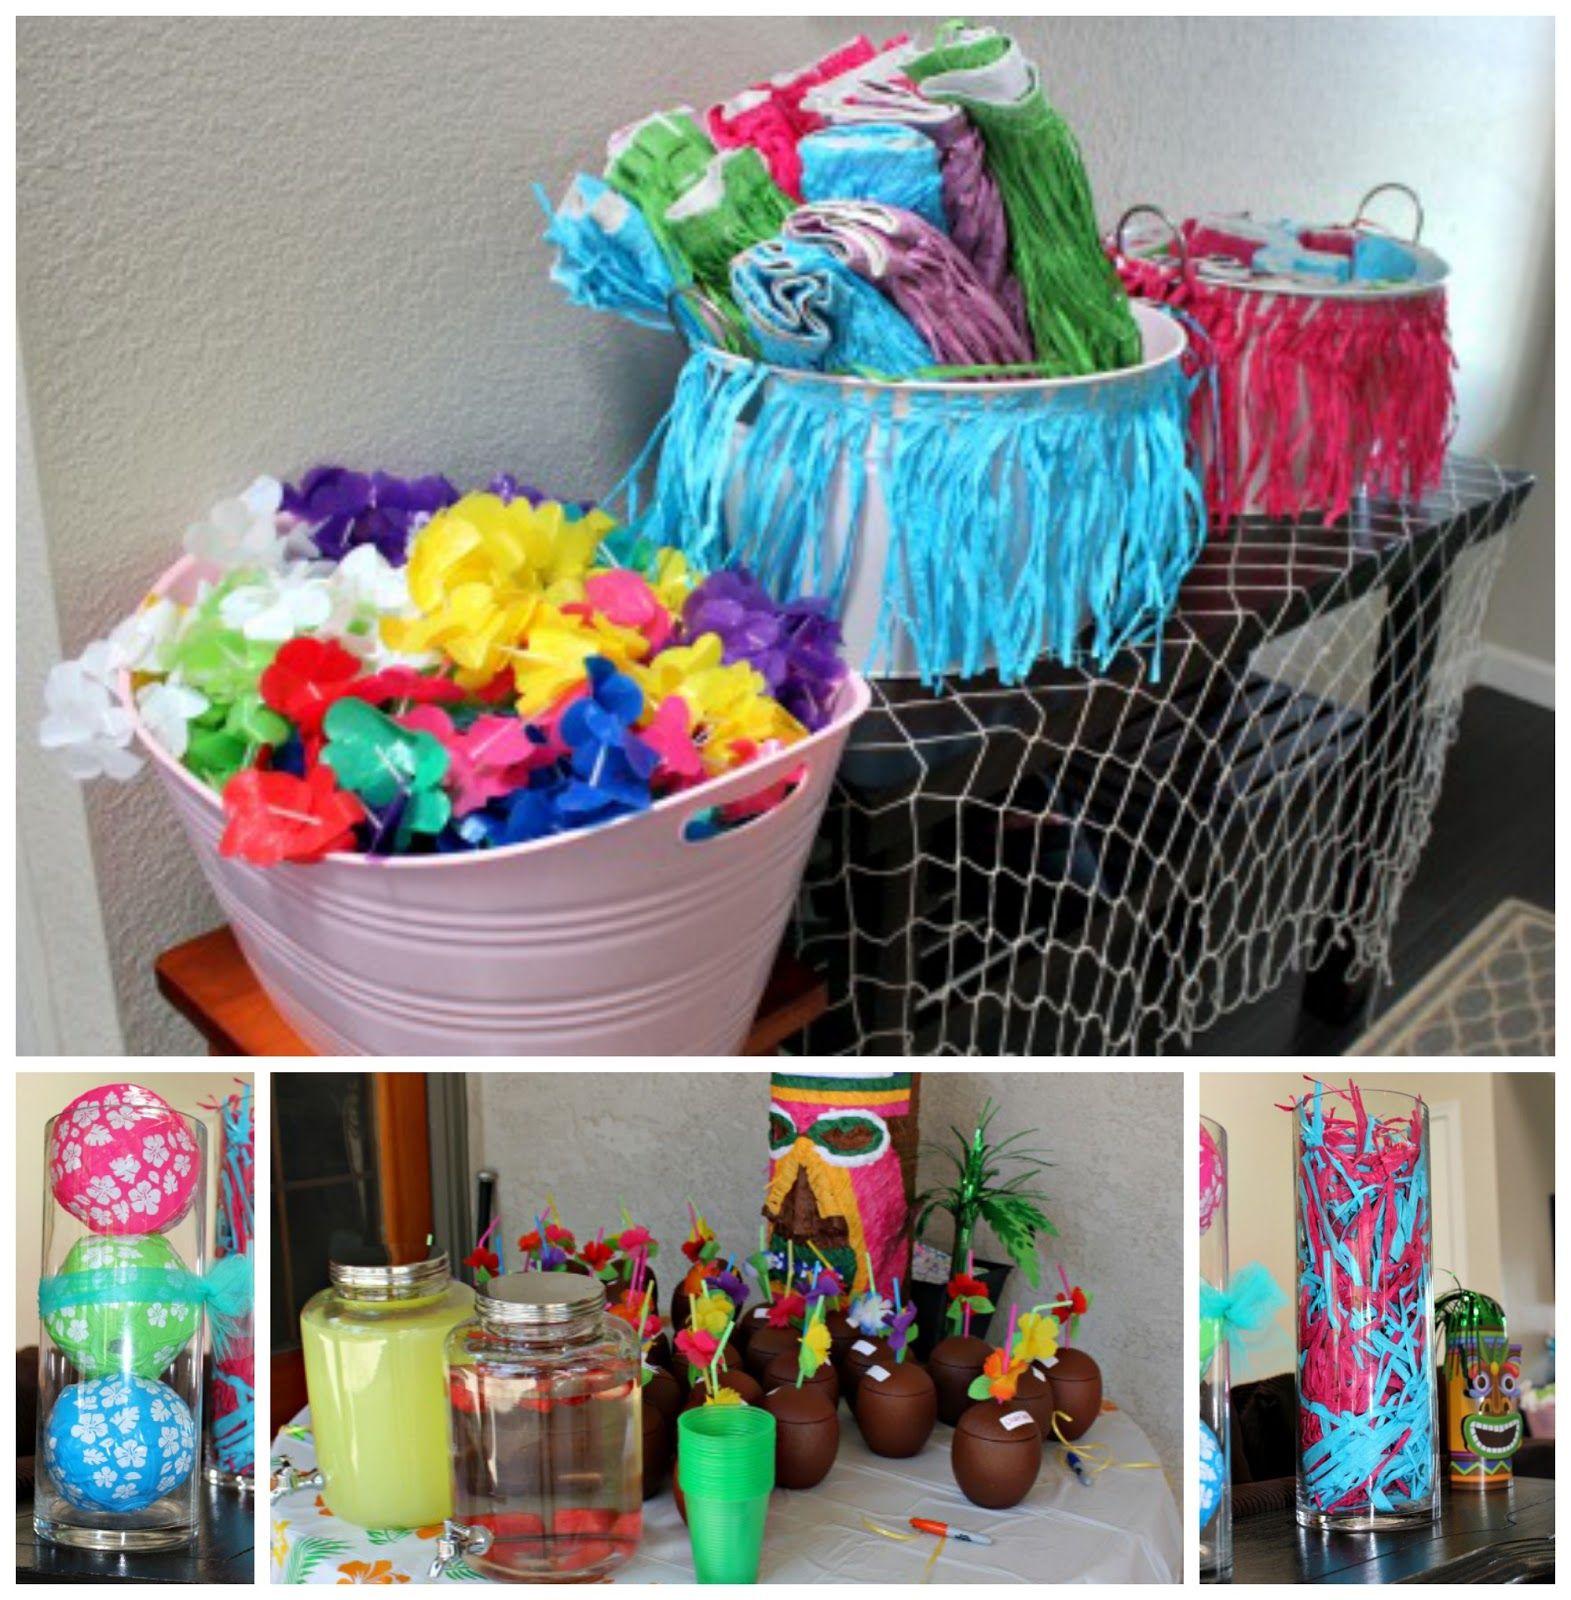 Diy Luau Party Ideas  Food And Decor Each Guest